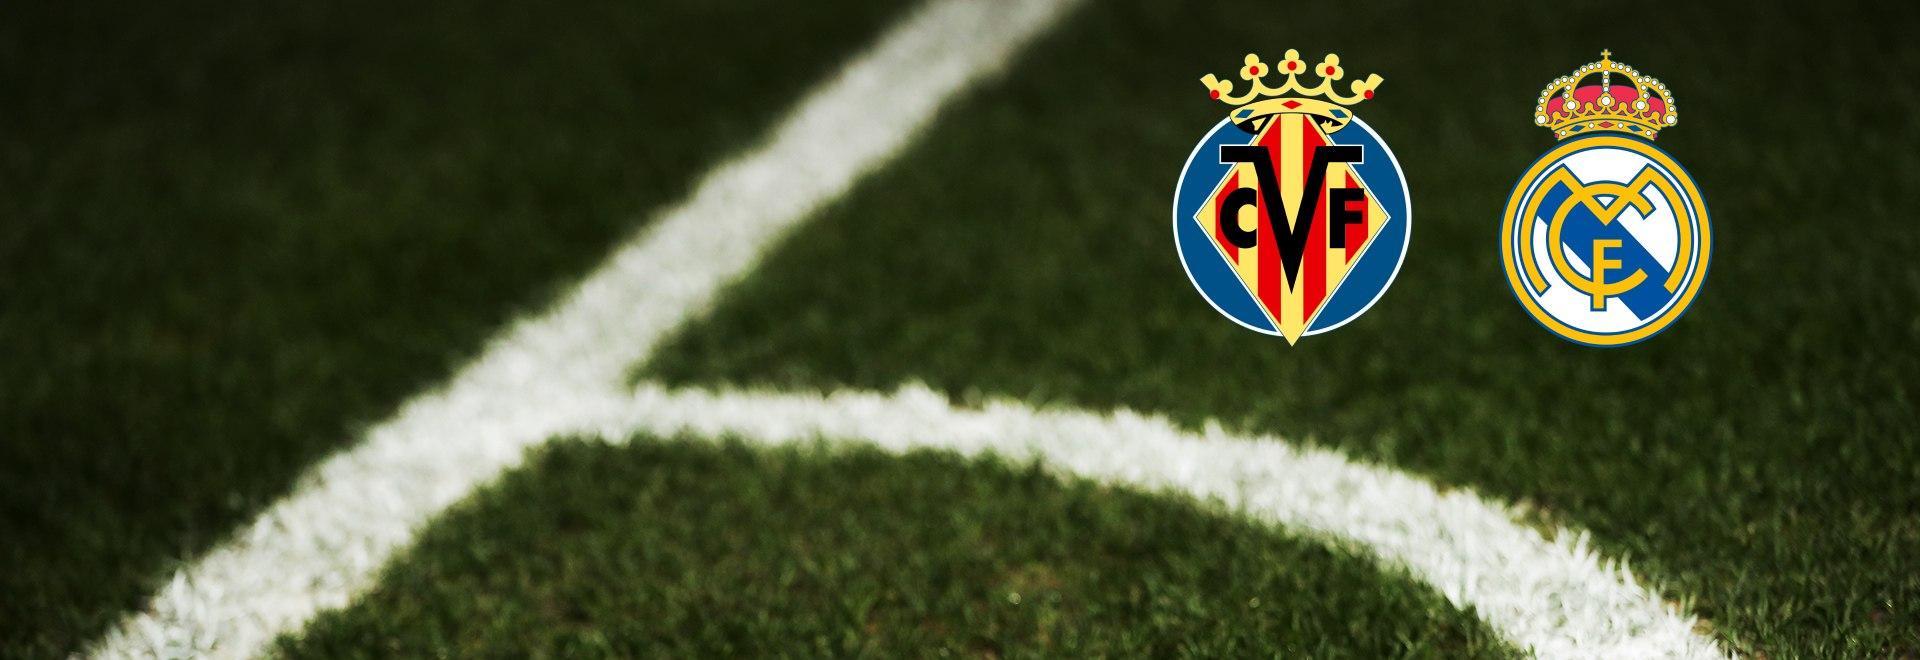 Villarreal - Real Madrid. 10a g.